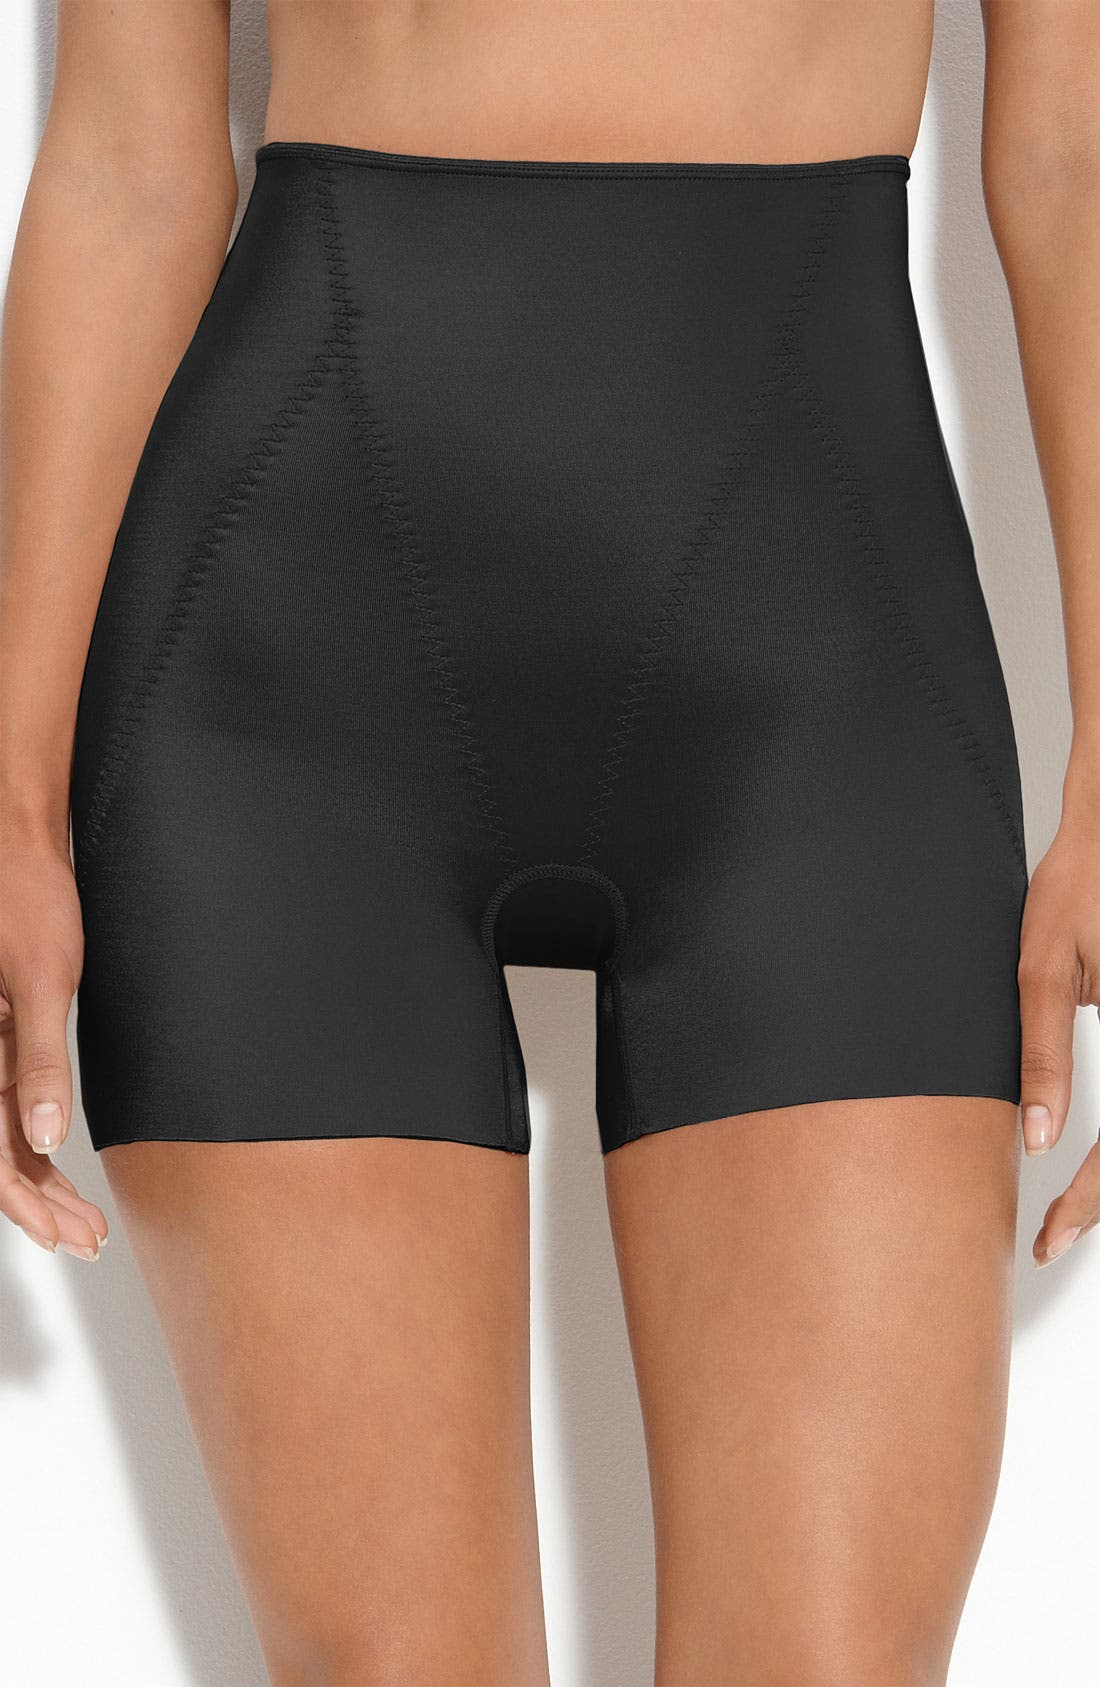 Alternate Image 2  - SPANX® 'Slimplicity Butt Boosting' Girl Shorts